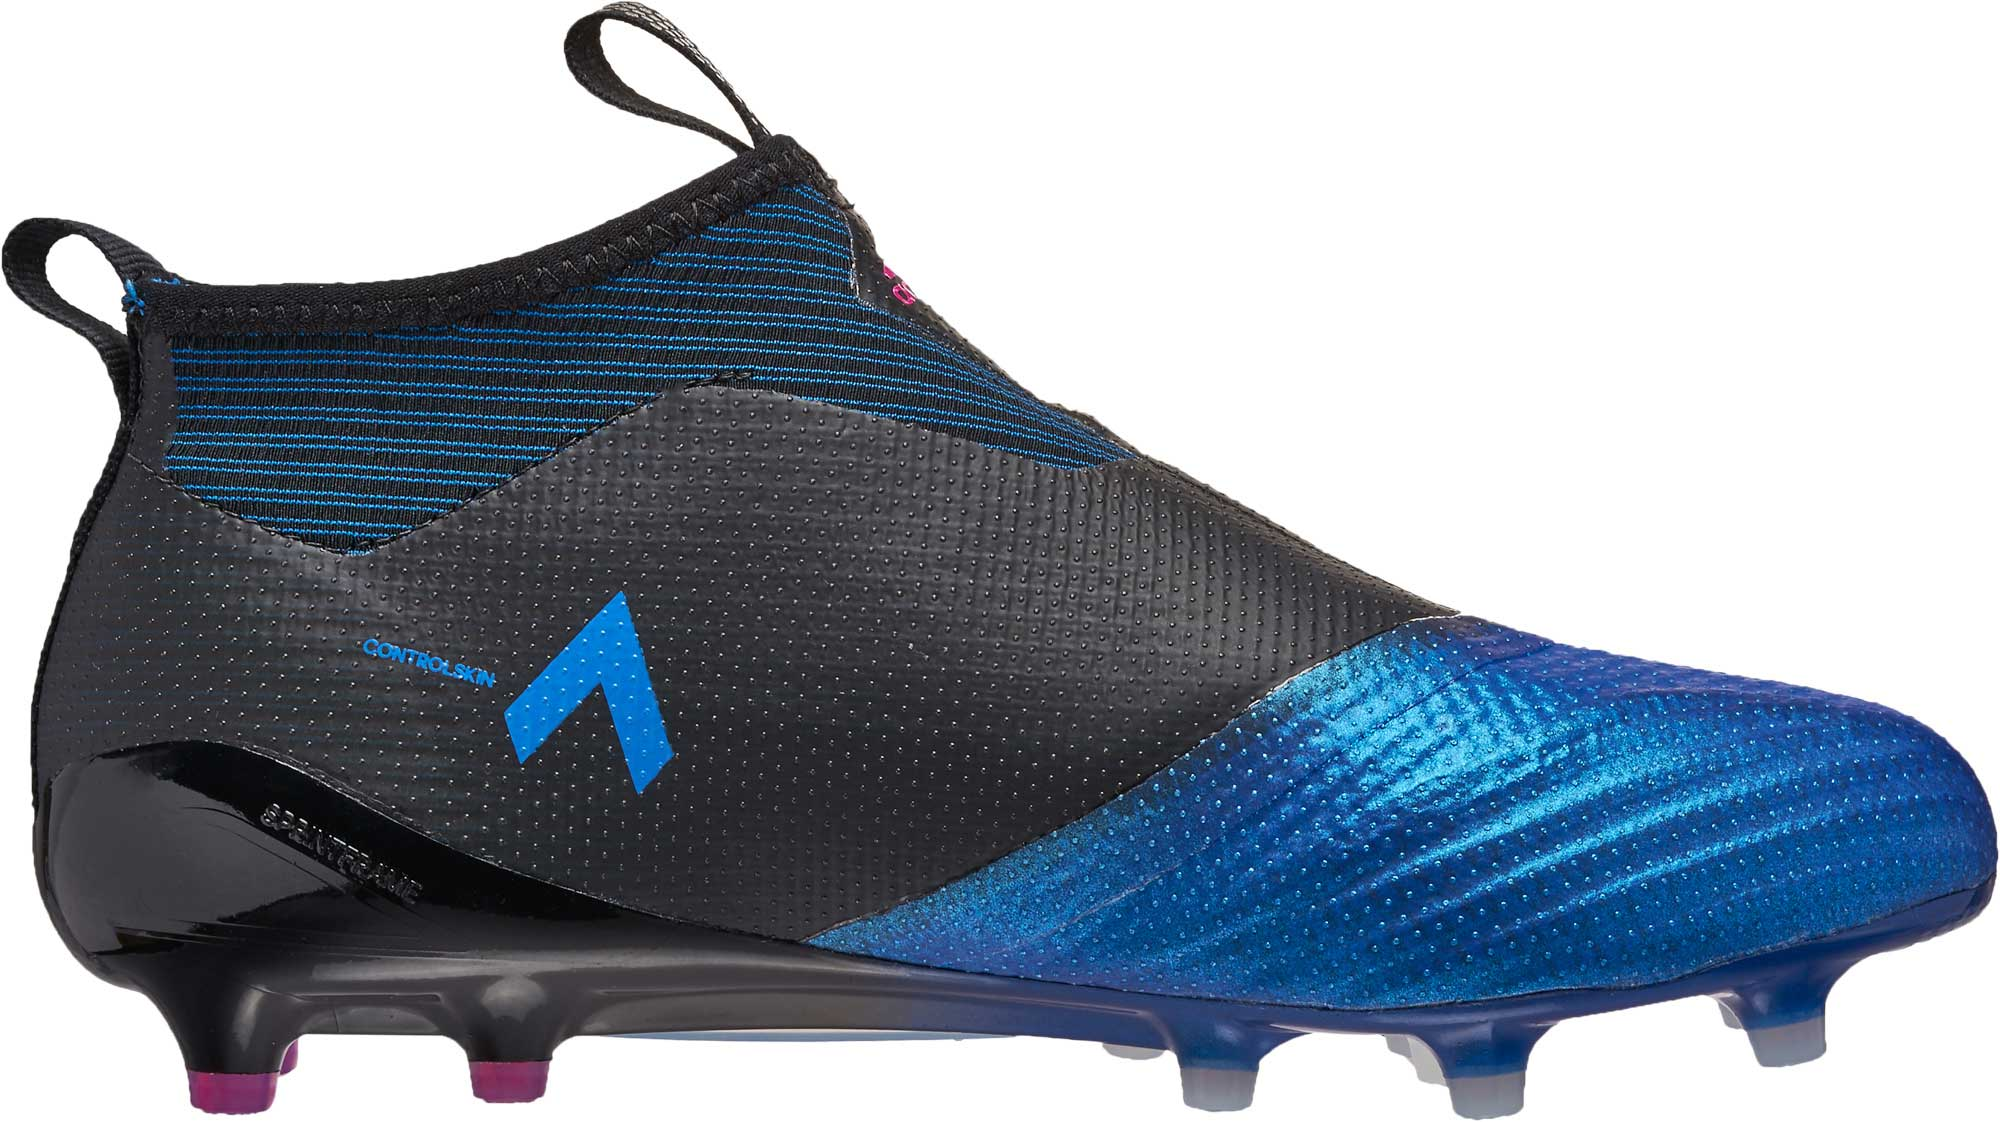 reputable site 7c873 6e650 adidas ACE 17 Purecontrol FG - adidas ACE Soccer Cleats